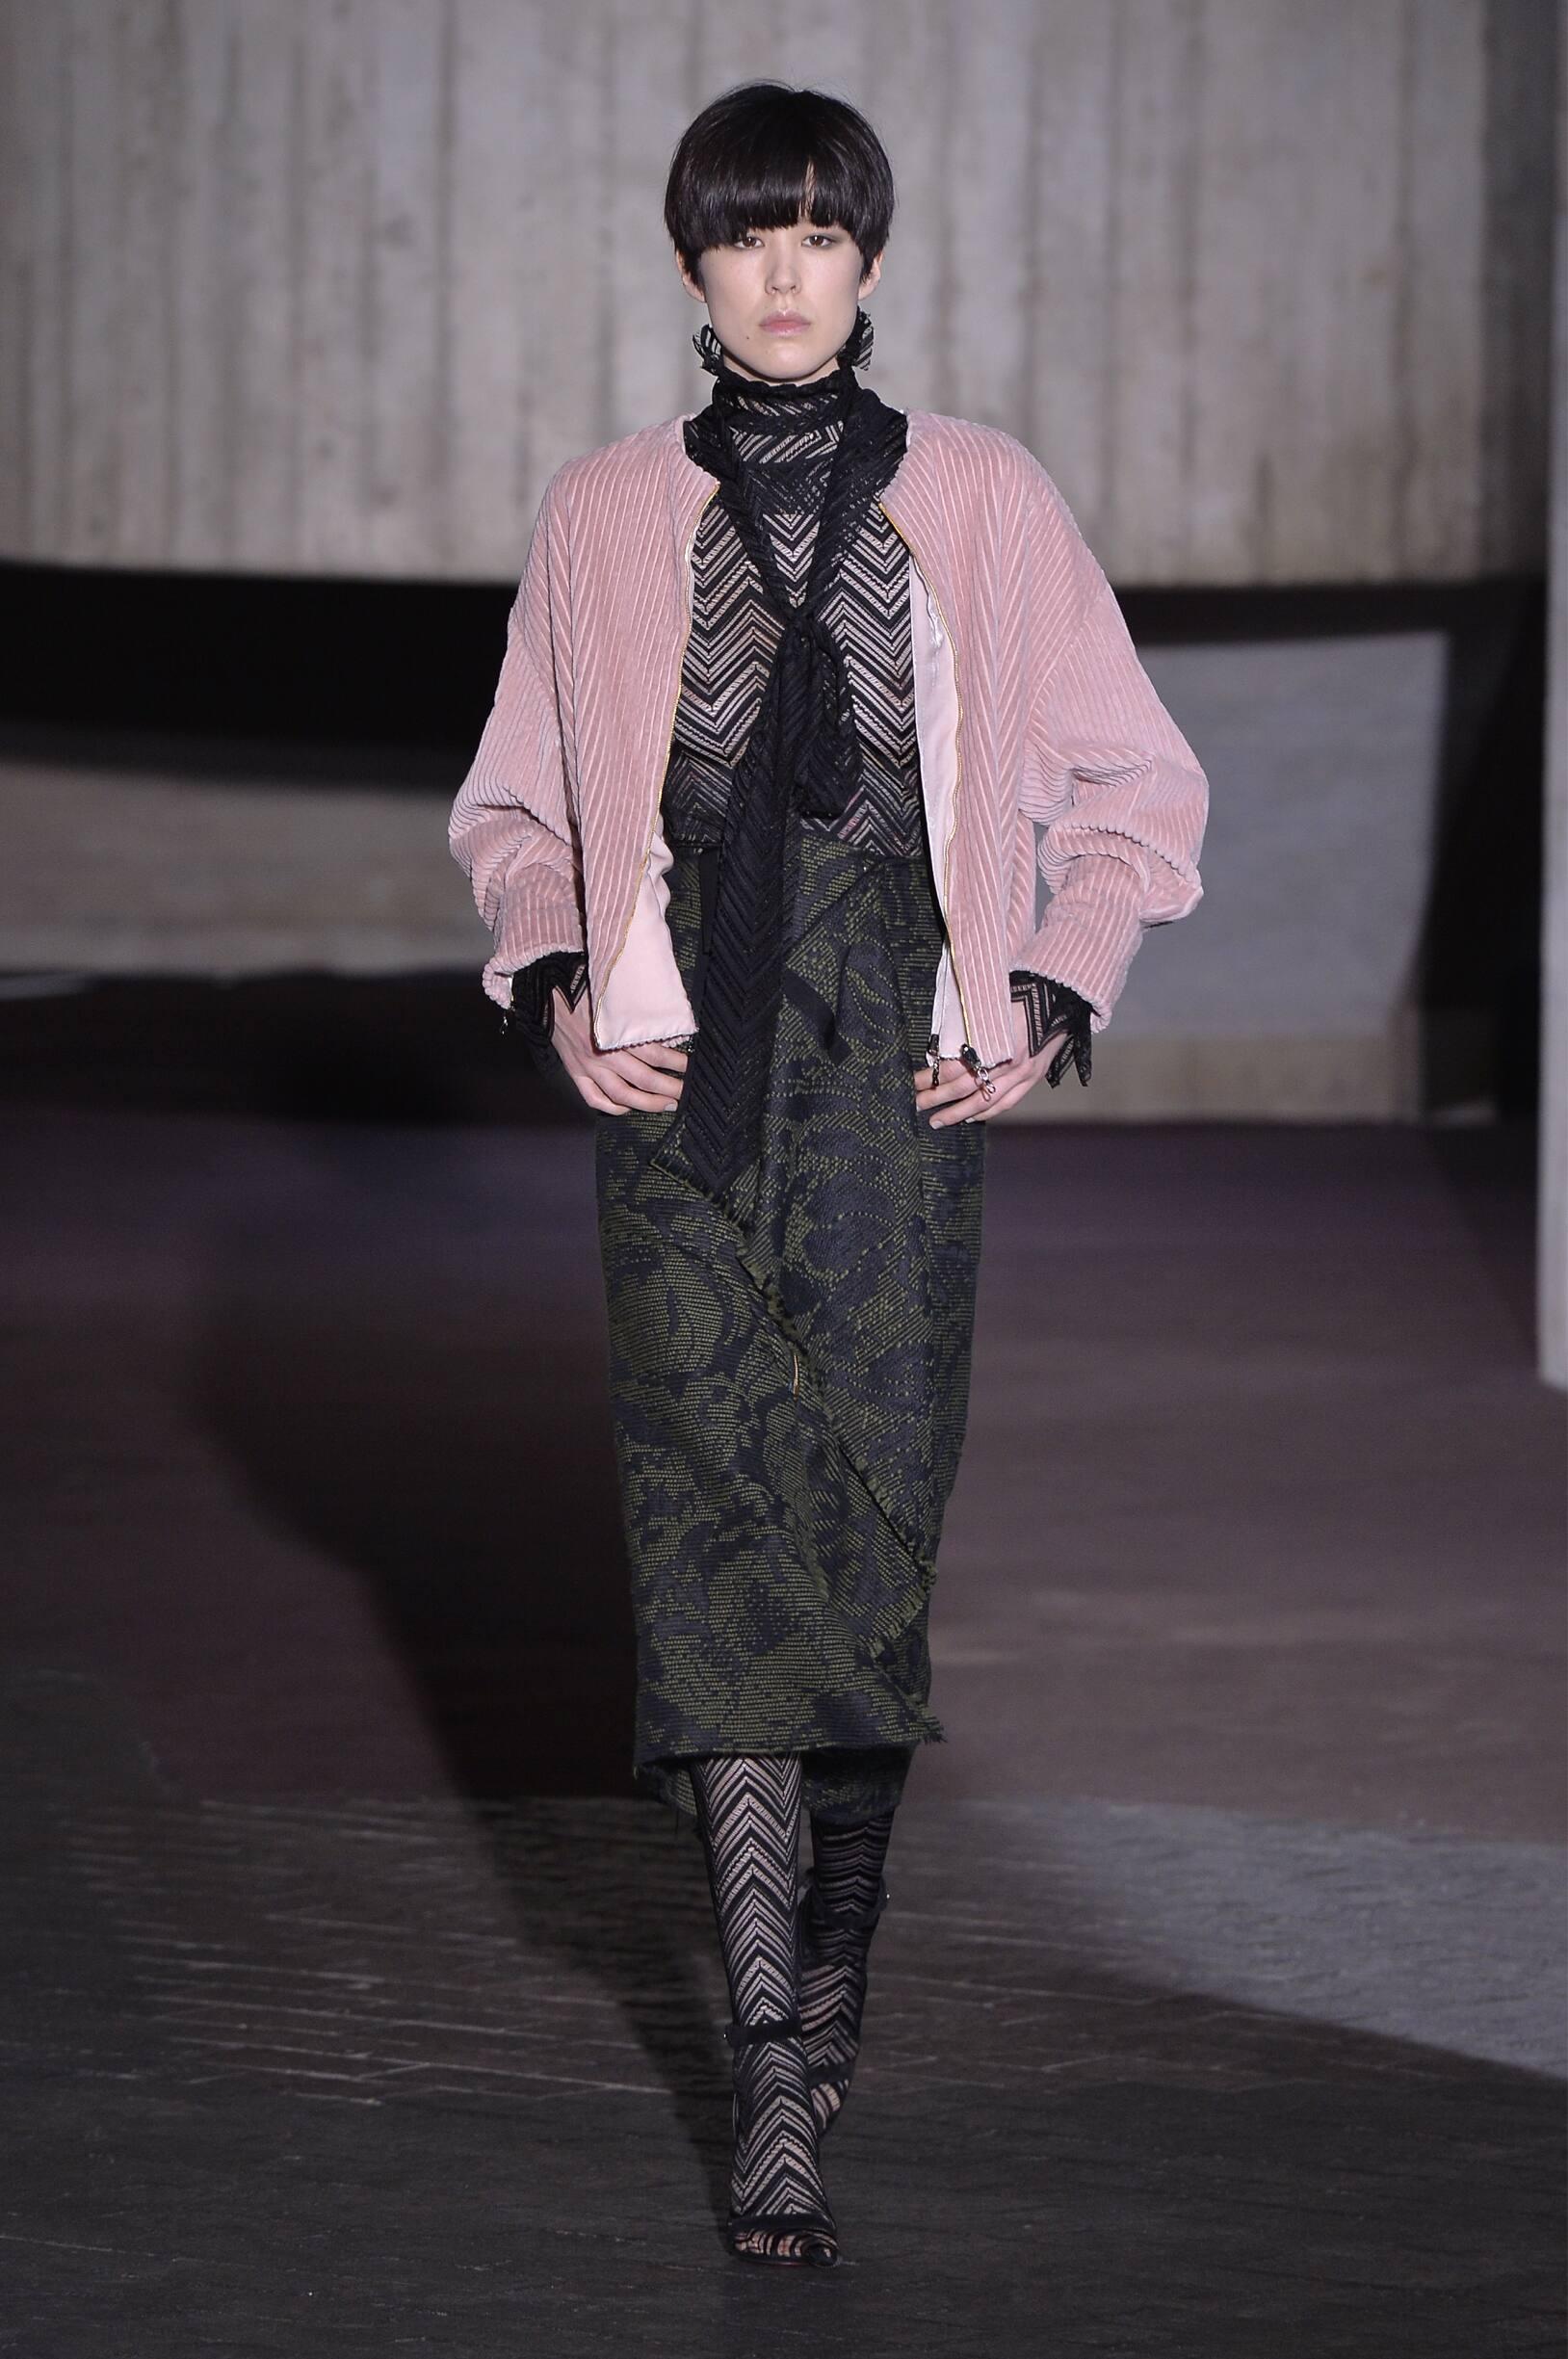 Fashion Model Roland Mouret Catwalk